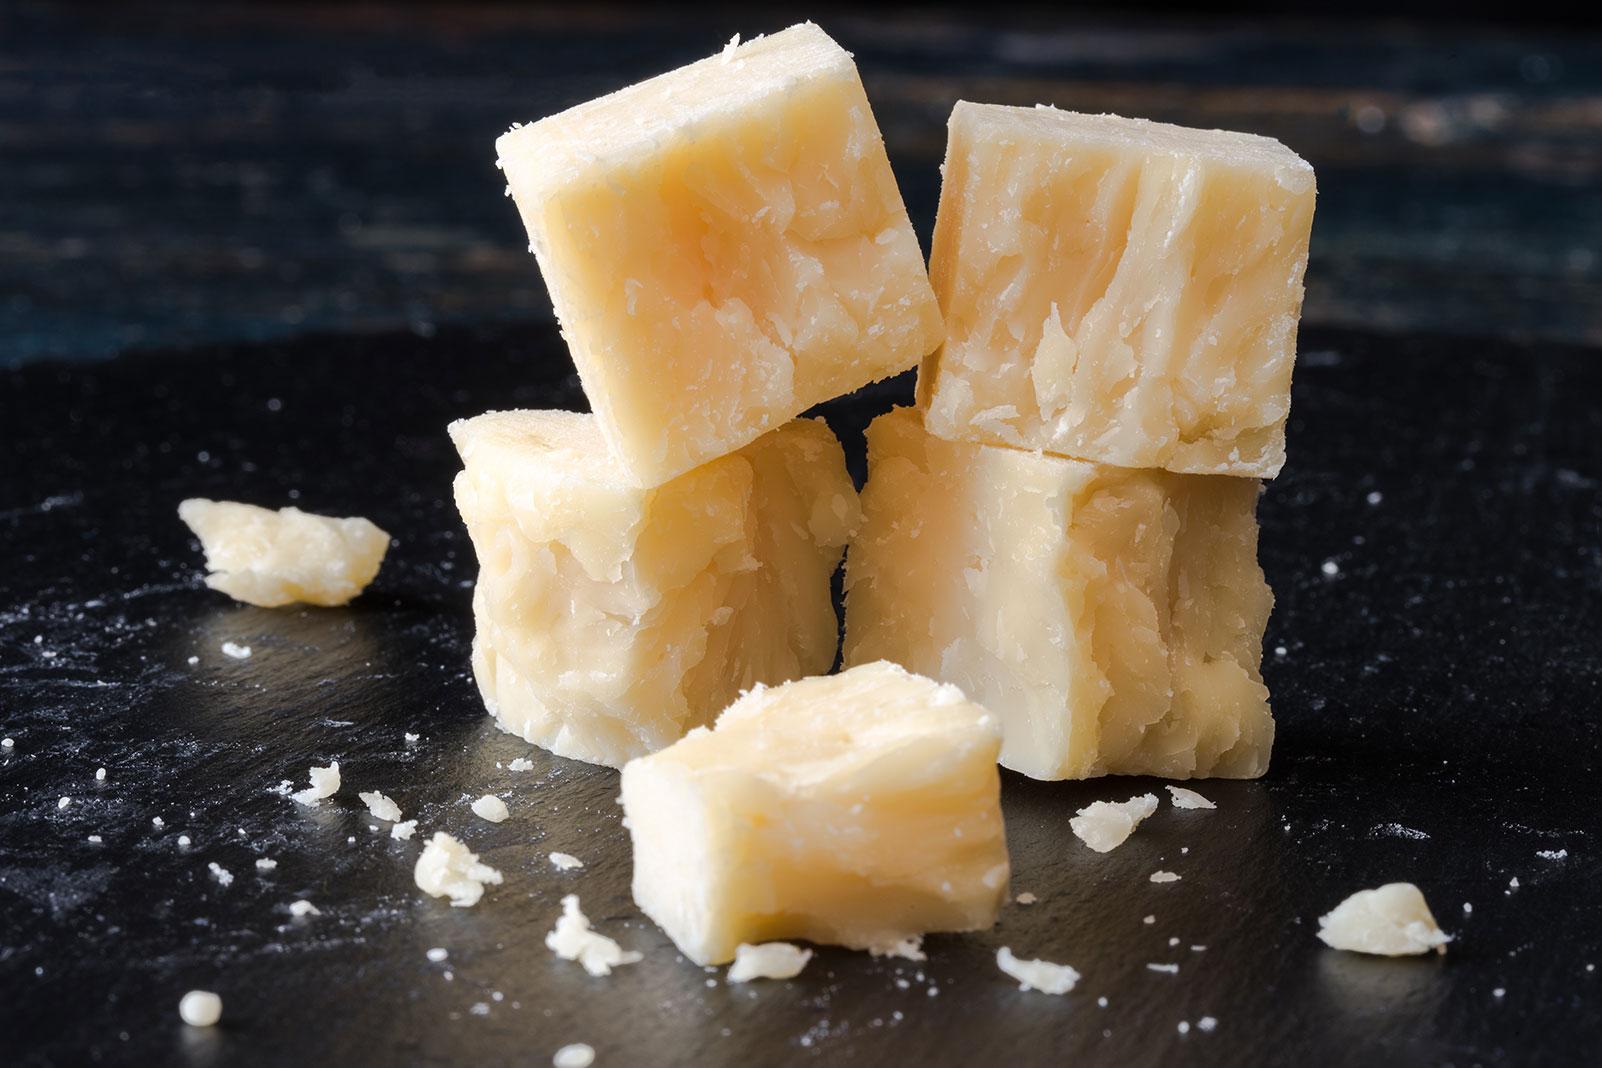 grass-fed-A2-protein-cheese.jpg